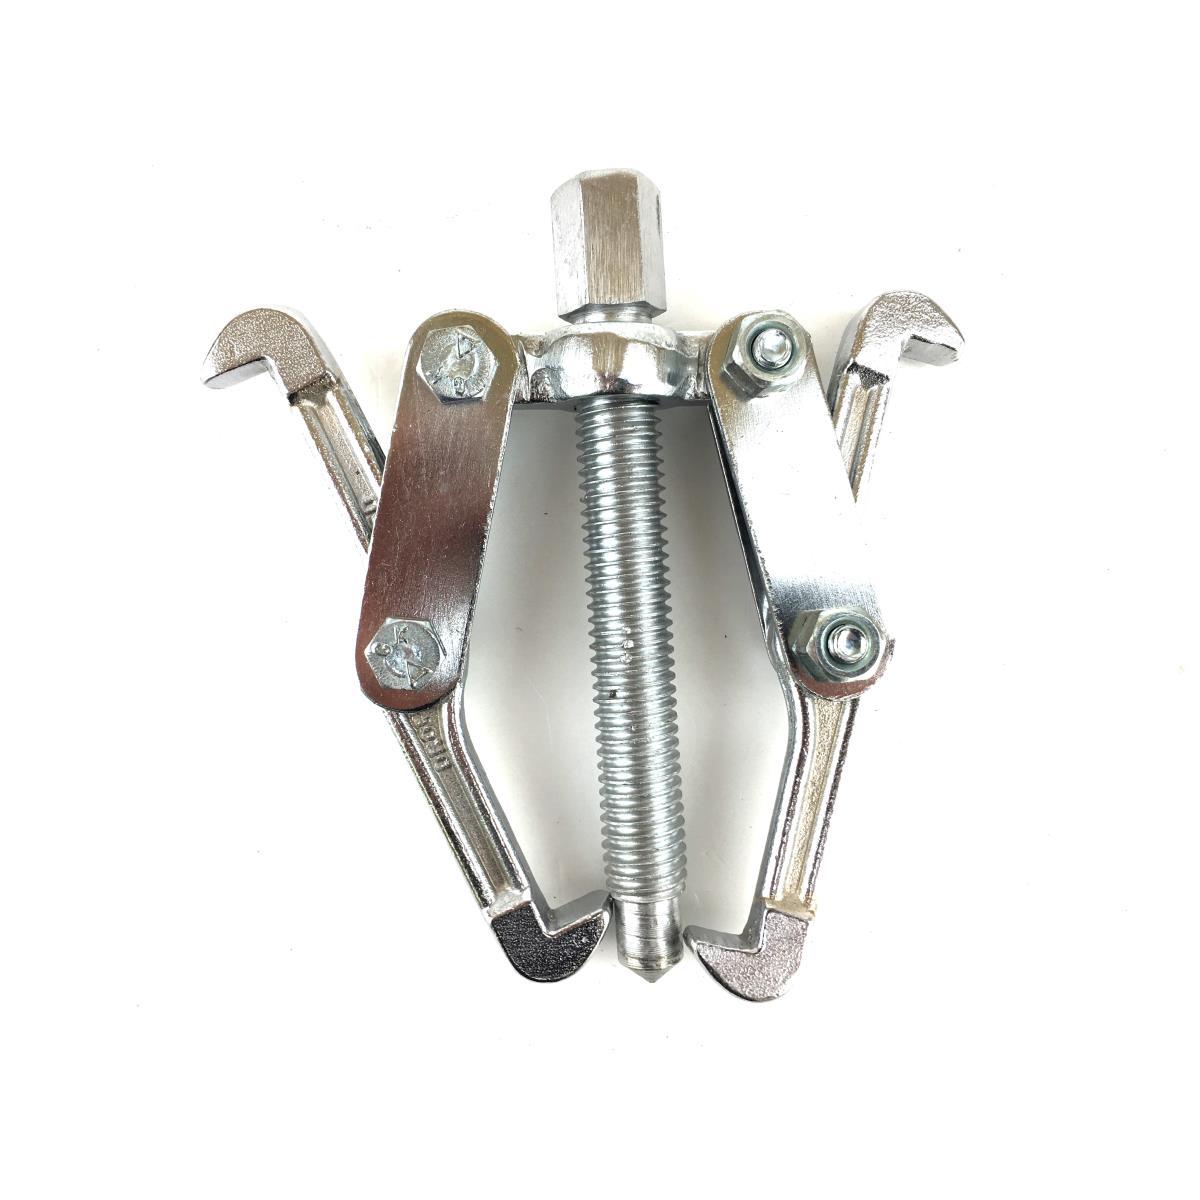 Lagerabzieher 2-armig  Parallel Abzieher Abziehgerät Außenabzieher Ausdrücker ,UAB,000050600284, 4820820124603